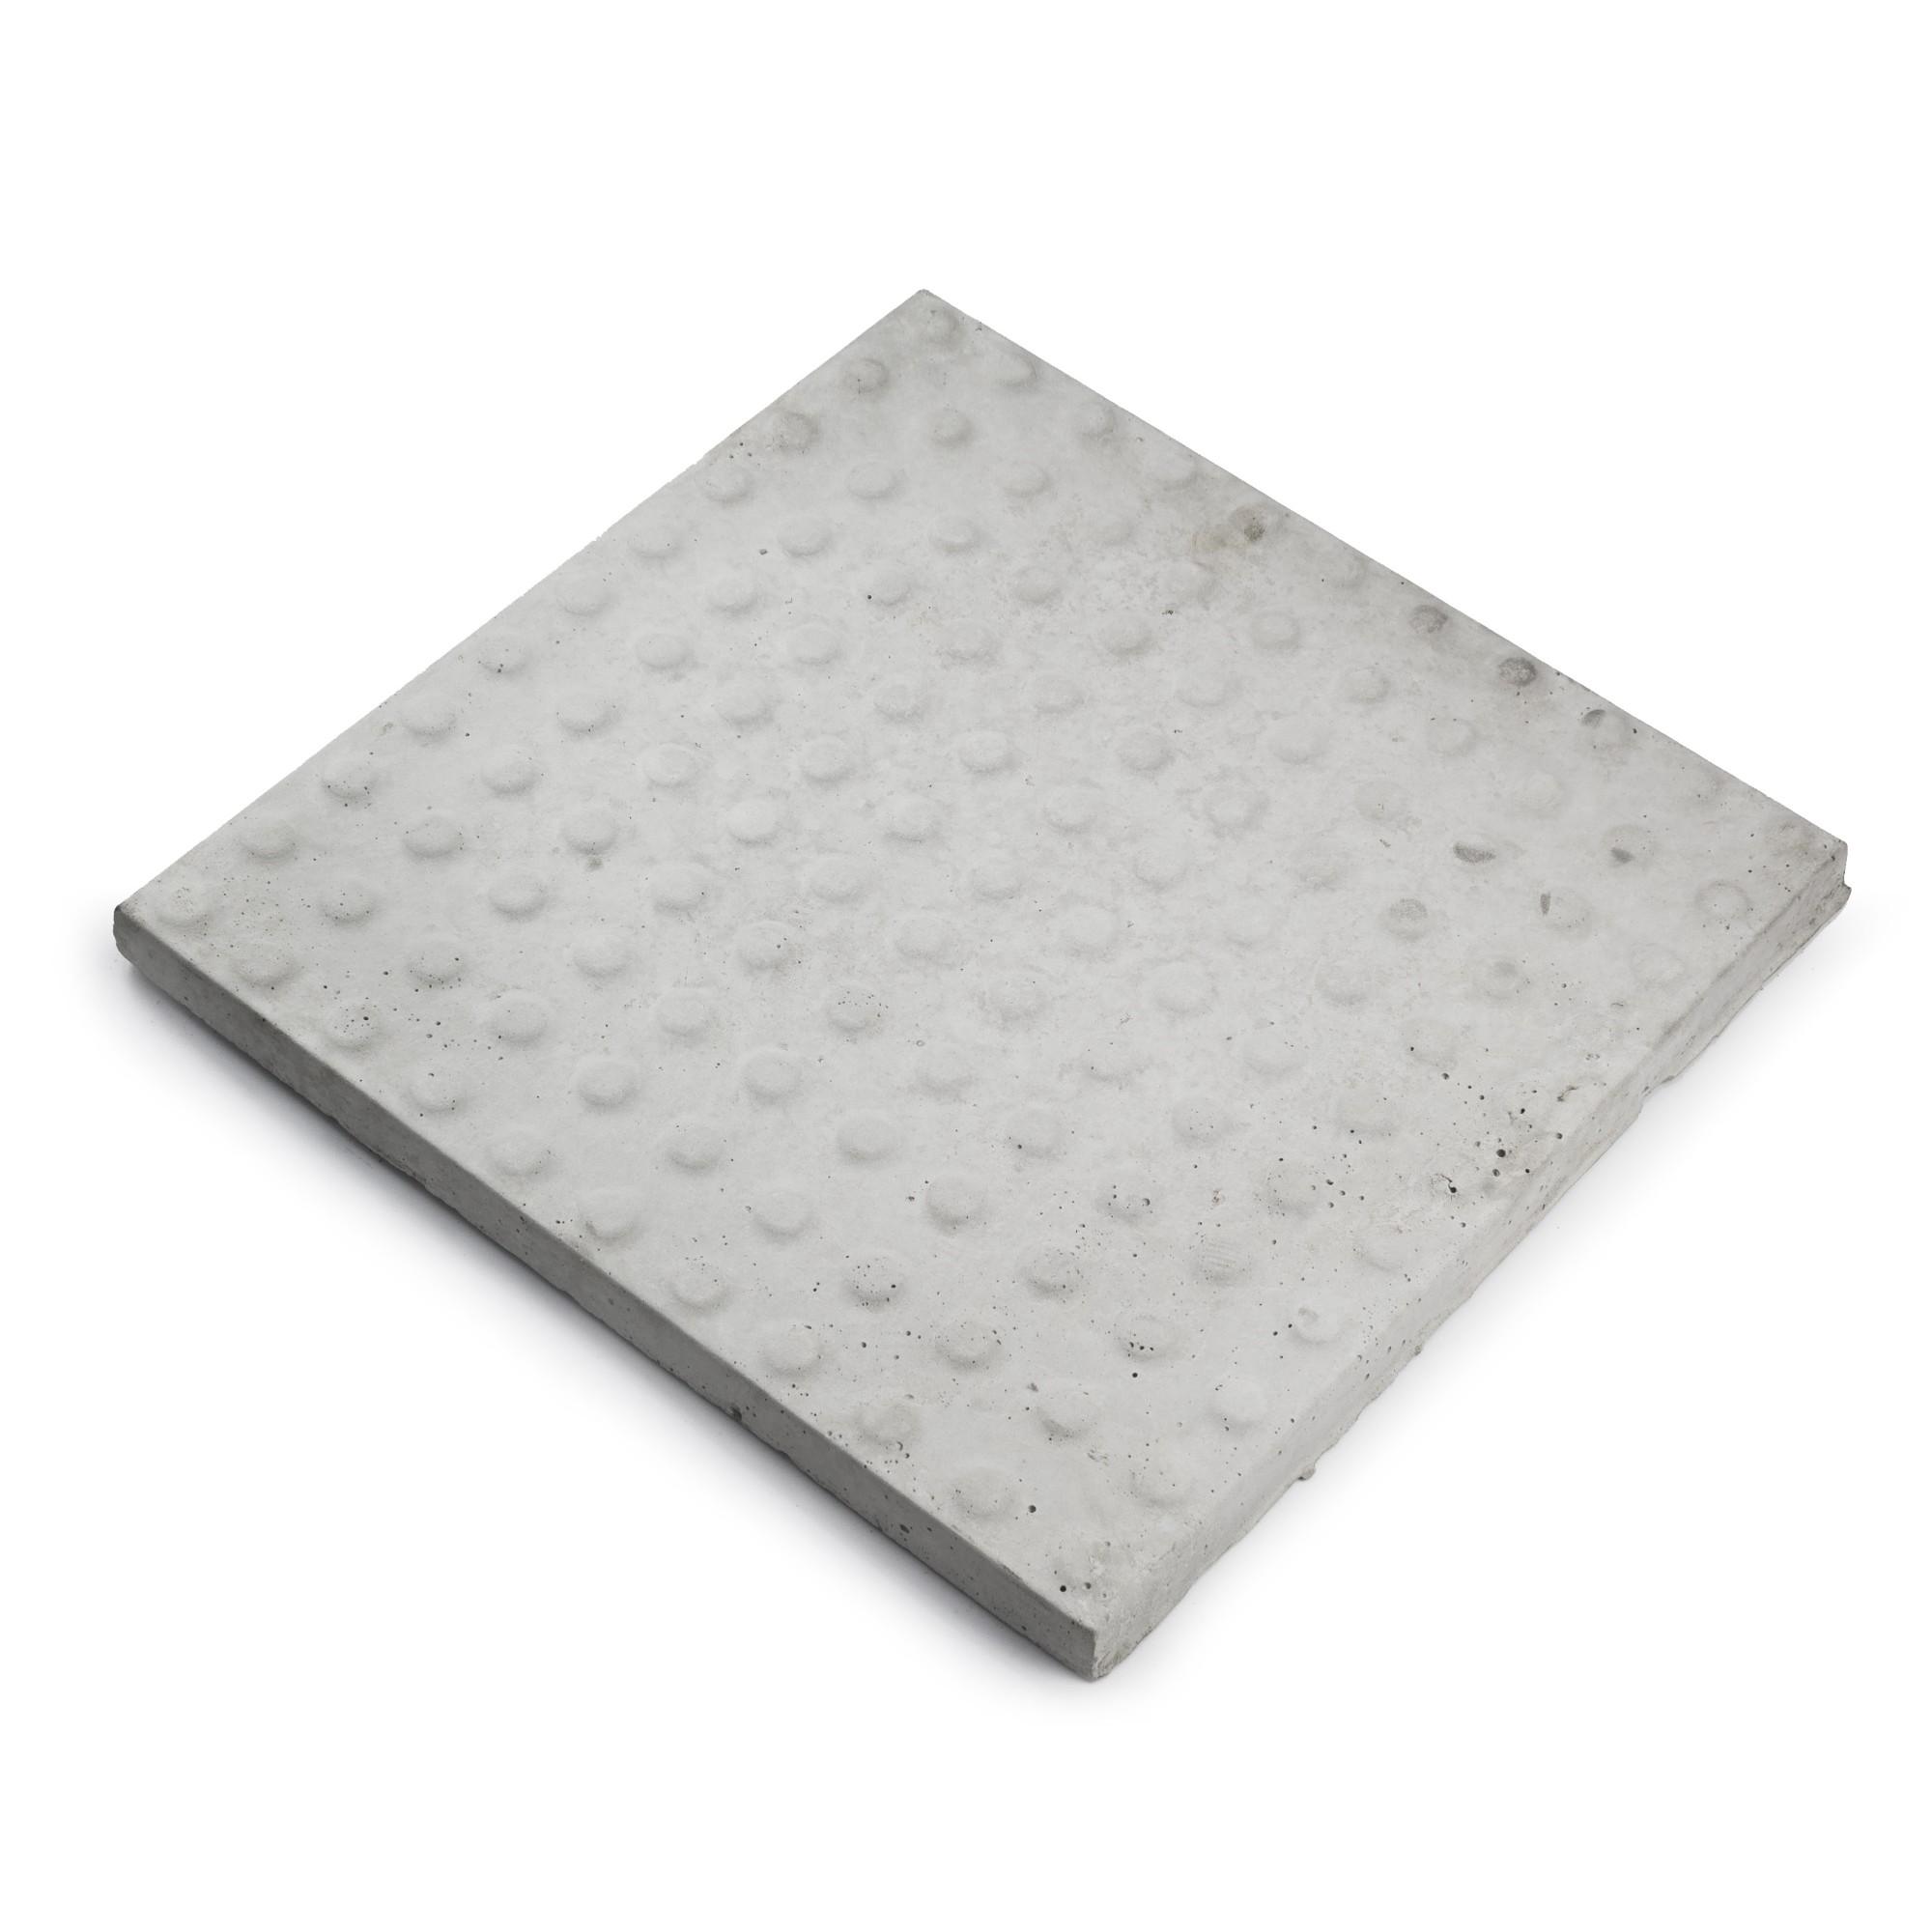 Lajota de Concreto Antiderrapante 50x50x03 cm - Premacil